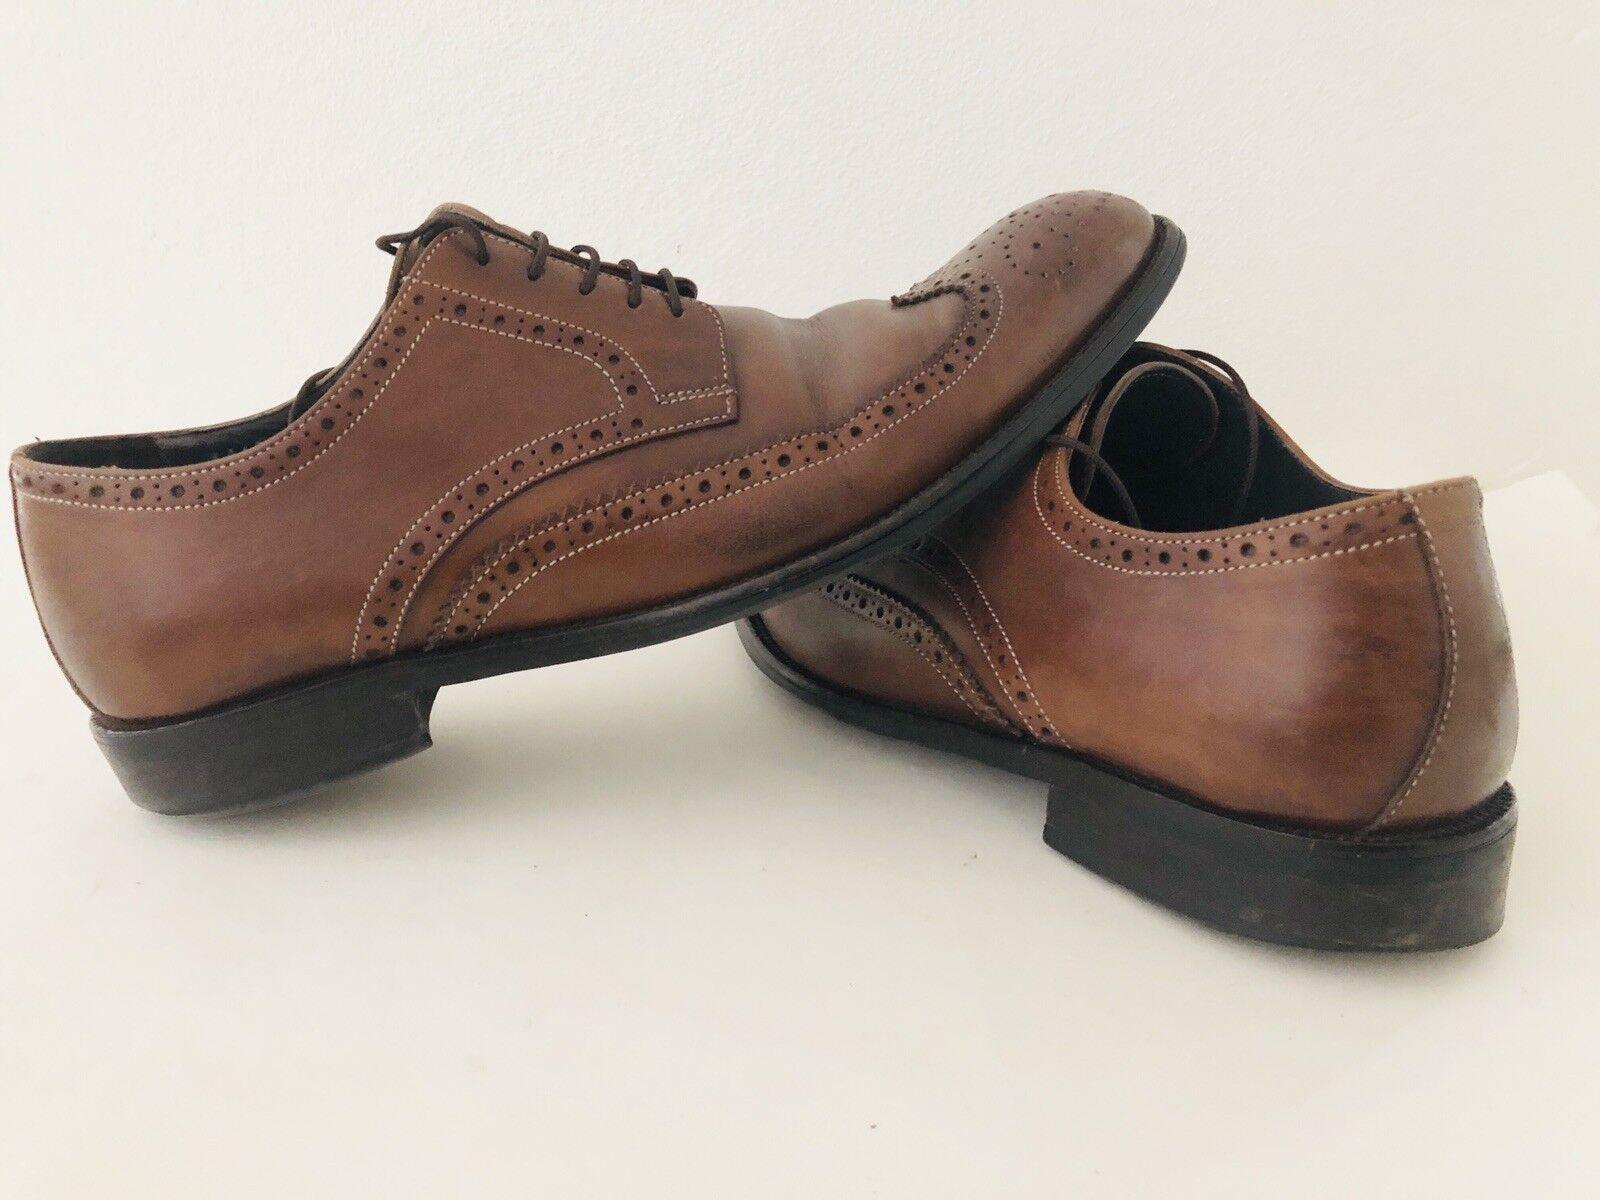 Too Boot New York Men's Cognac Wingtip Dress shoes- Size 10 In Very Good Shape